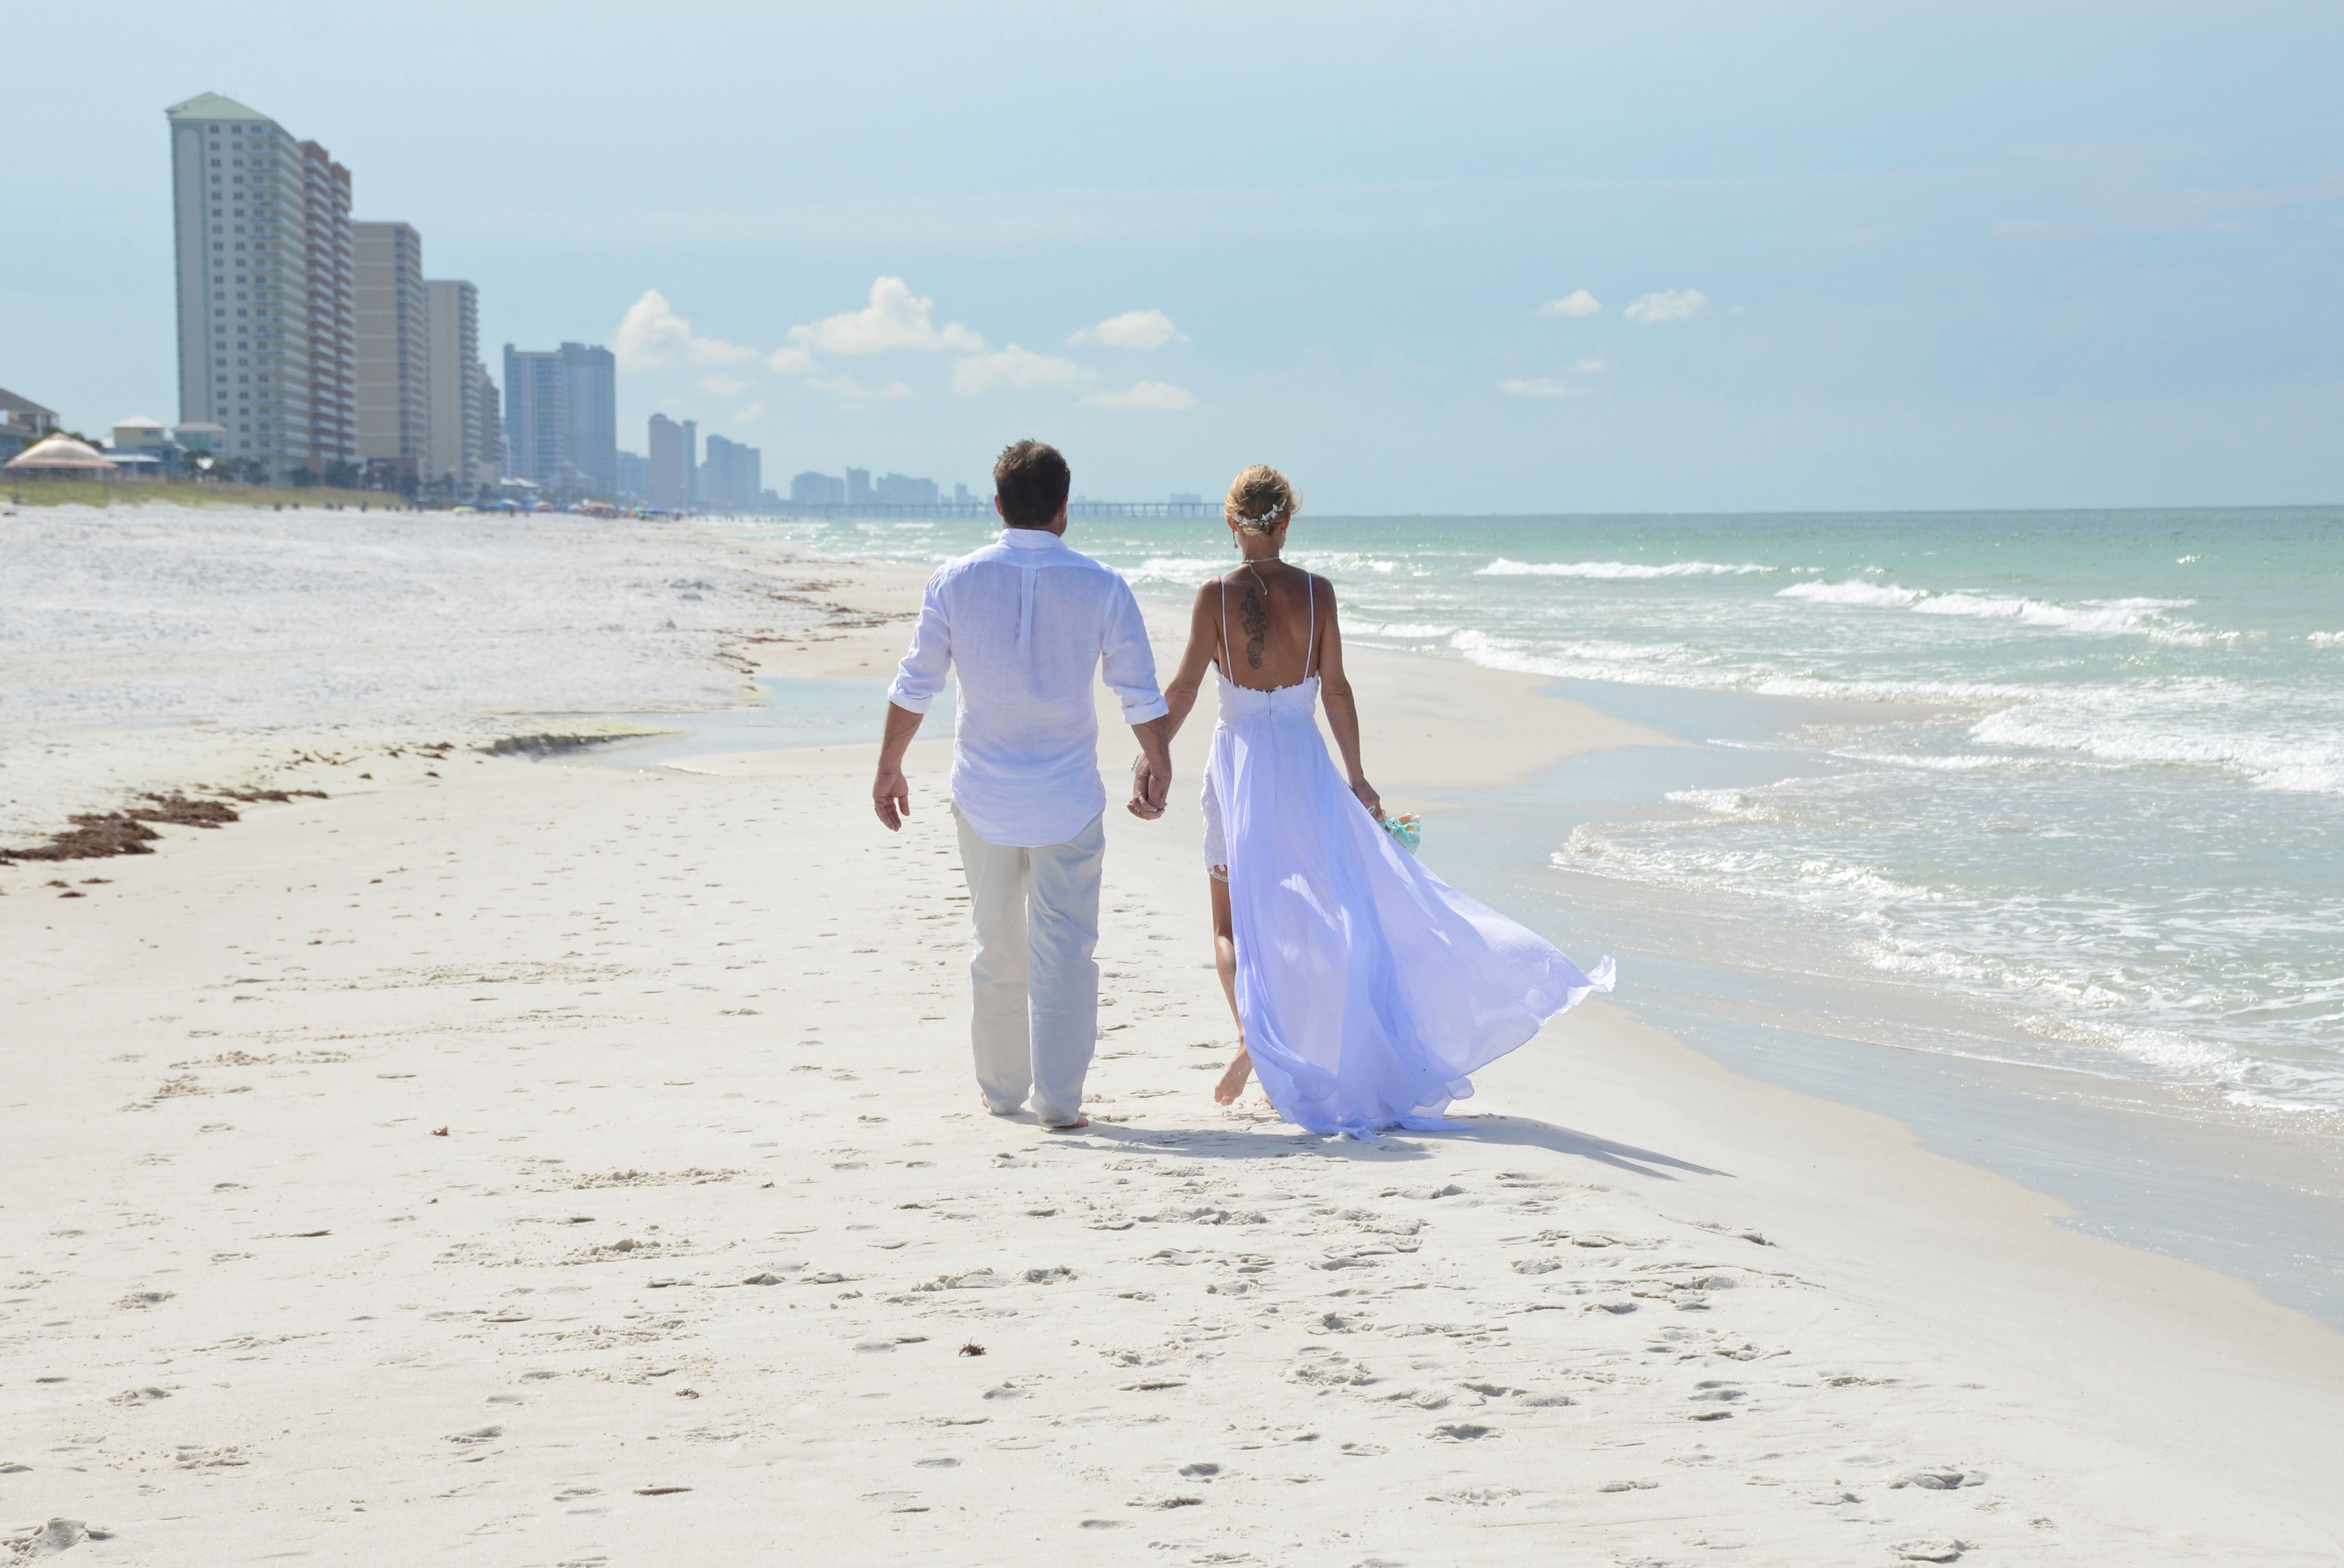 Florida Beach Wedding Florida Beach Wedding Panama City Beach Florida Sunset Beach Weddings